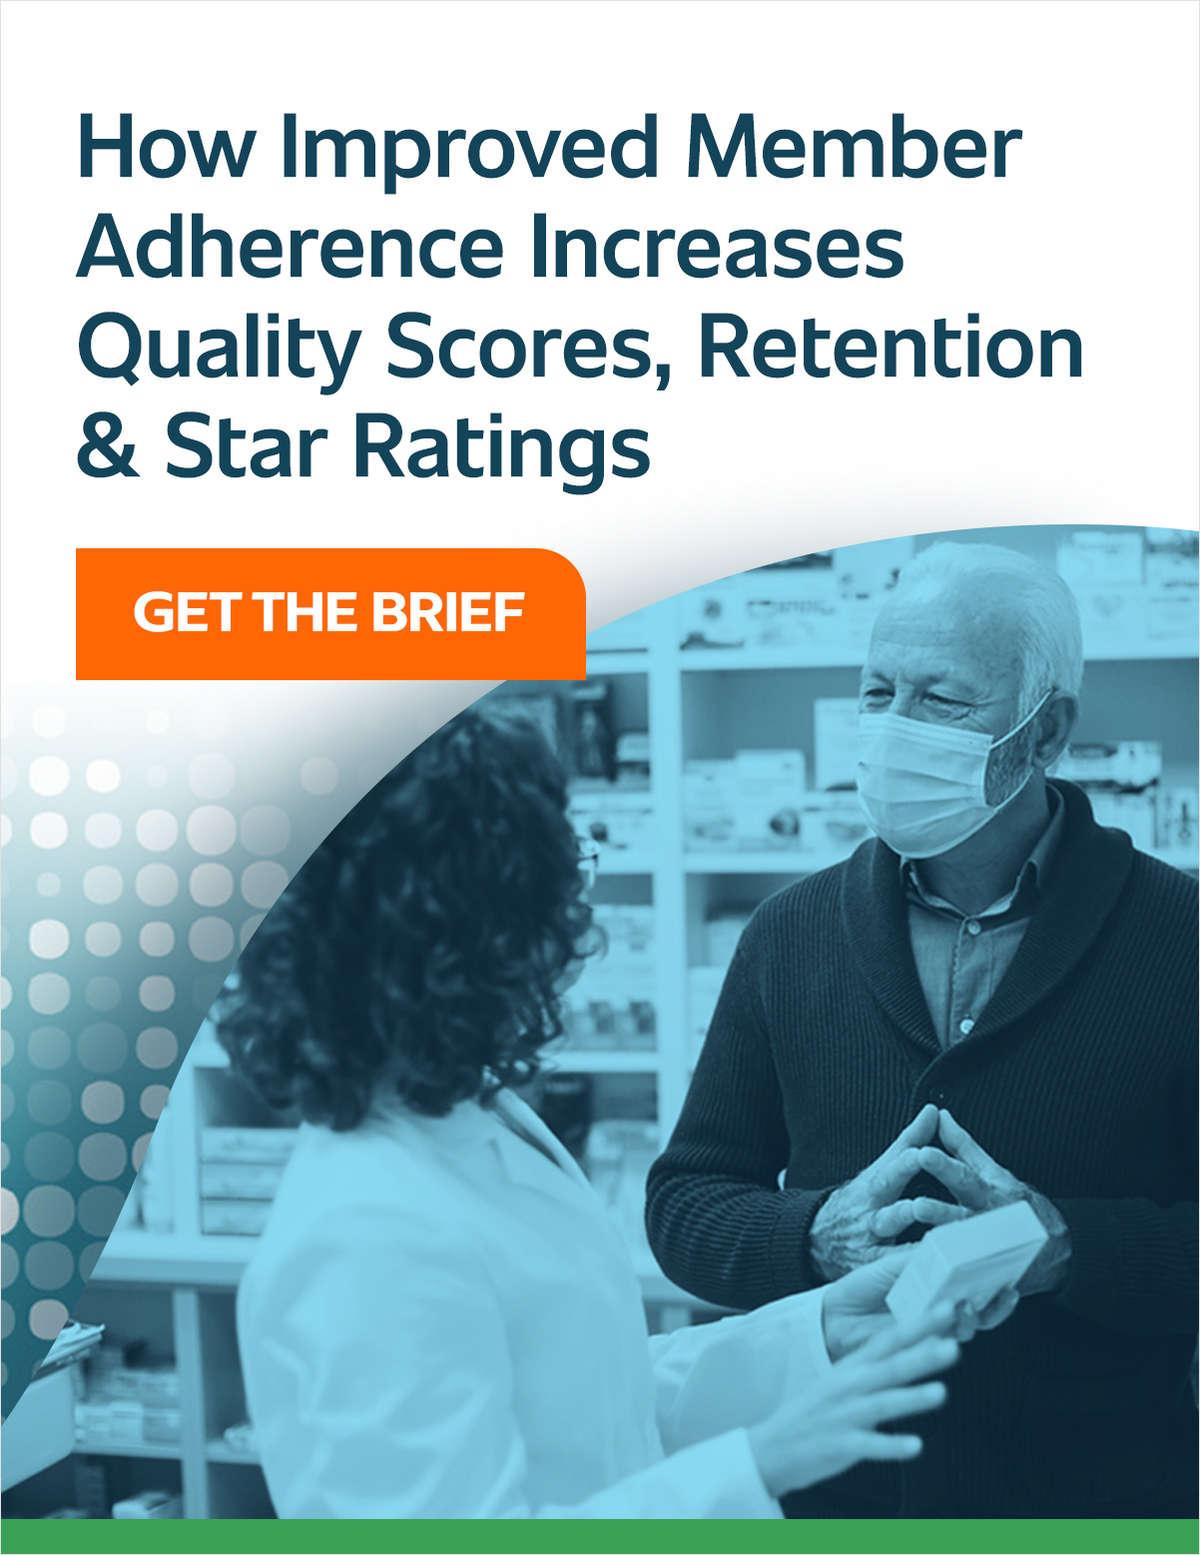 EnlivenHealth™ Comprehensive Adherence Solution for Health Plans